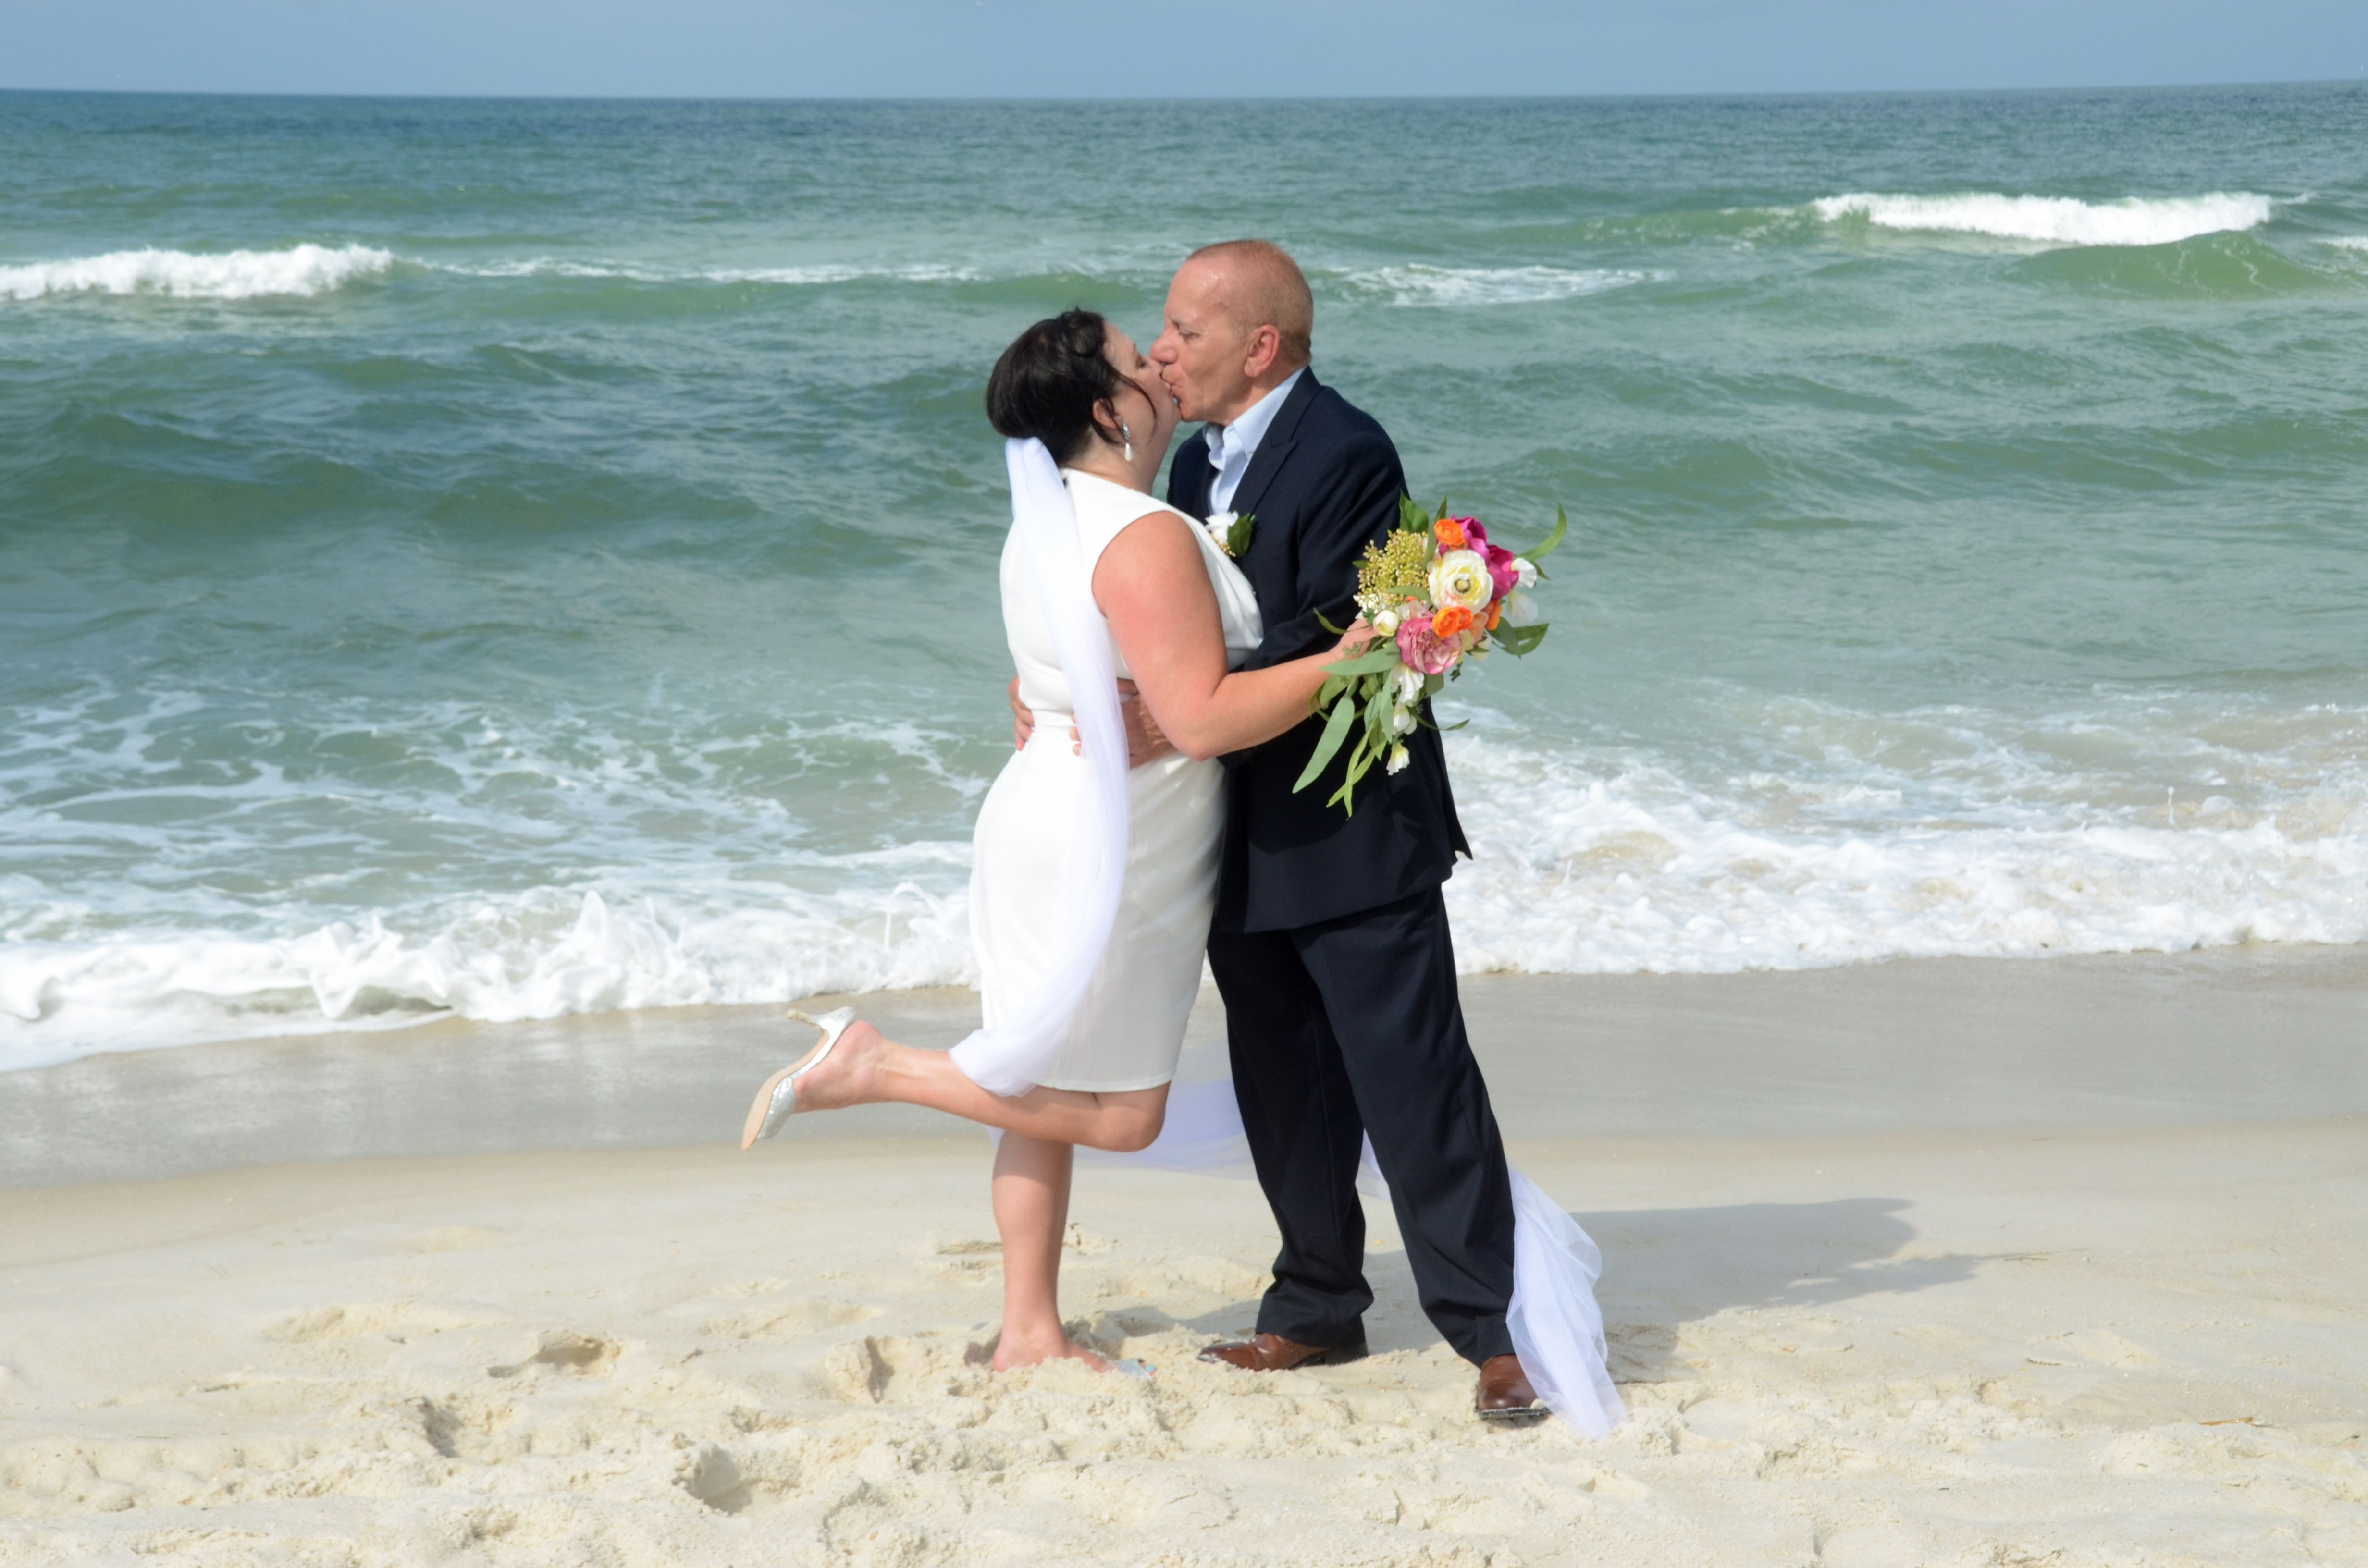 Florida Beach Wedding In 2020 Sunset Beach Weddings Florida Beach Wedding Beach Disney